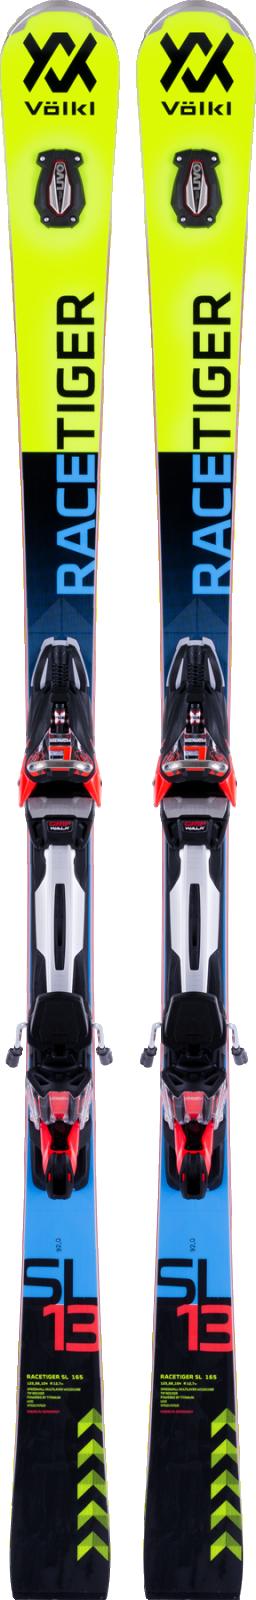 Völkl Racetiger SL + rMotion2 12 GW Race